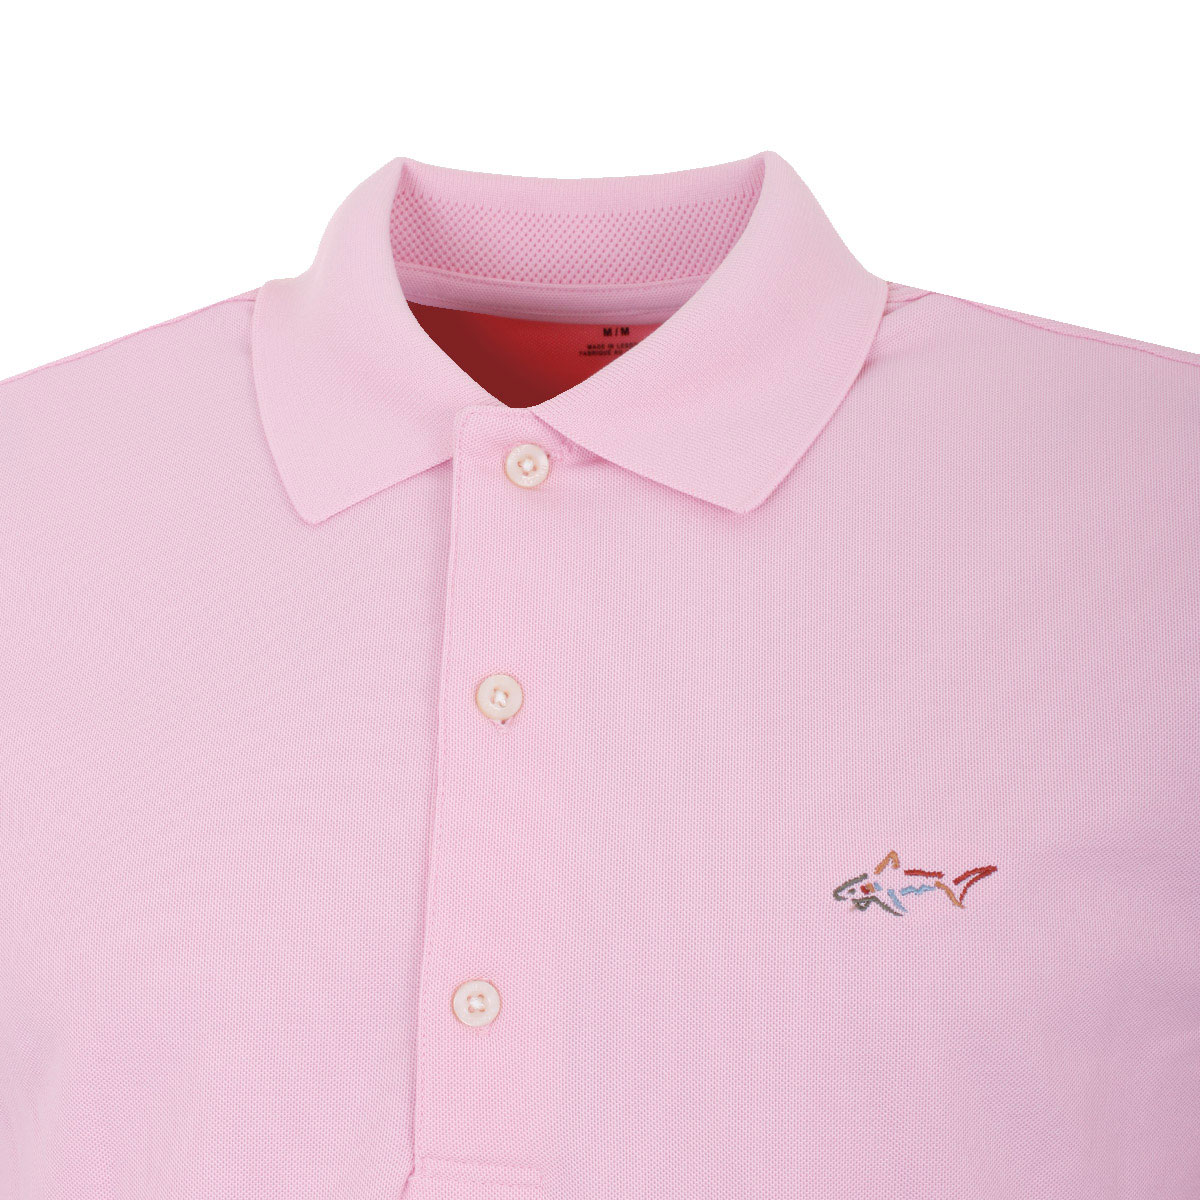 Greg-Norman-Mens-KX04-Performance-Micro-Pique-Golf-Polo-Shirt-28-OFF-RRP thumbnail 63